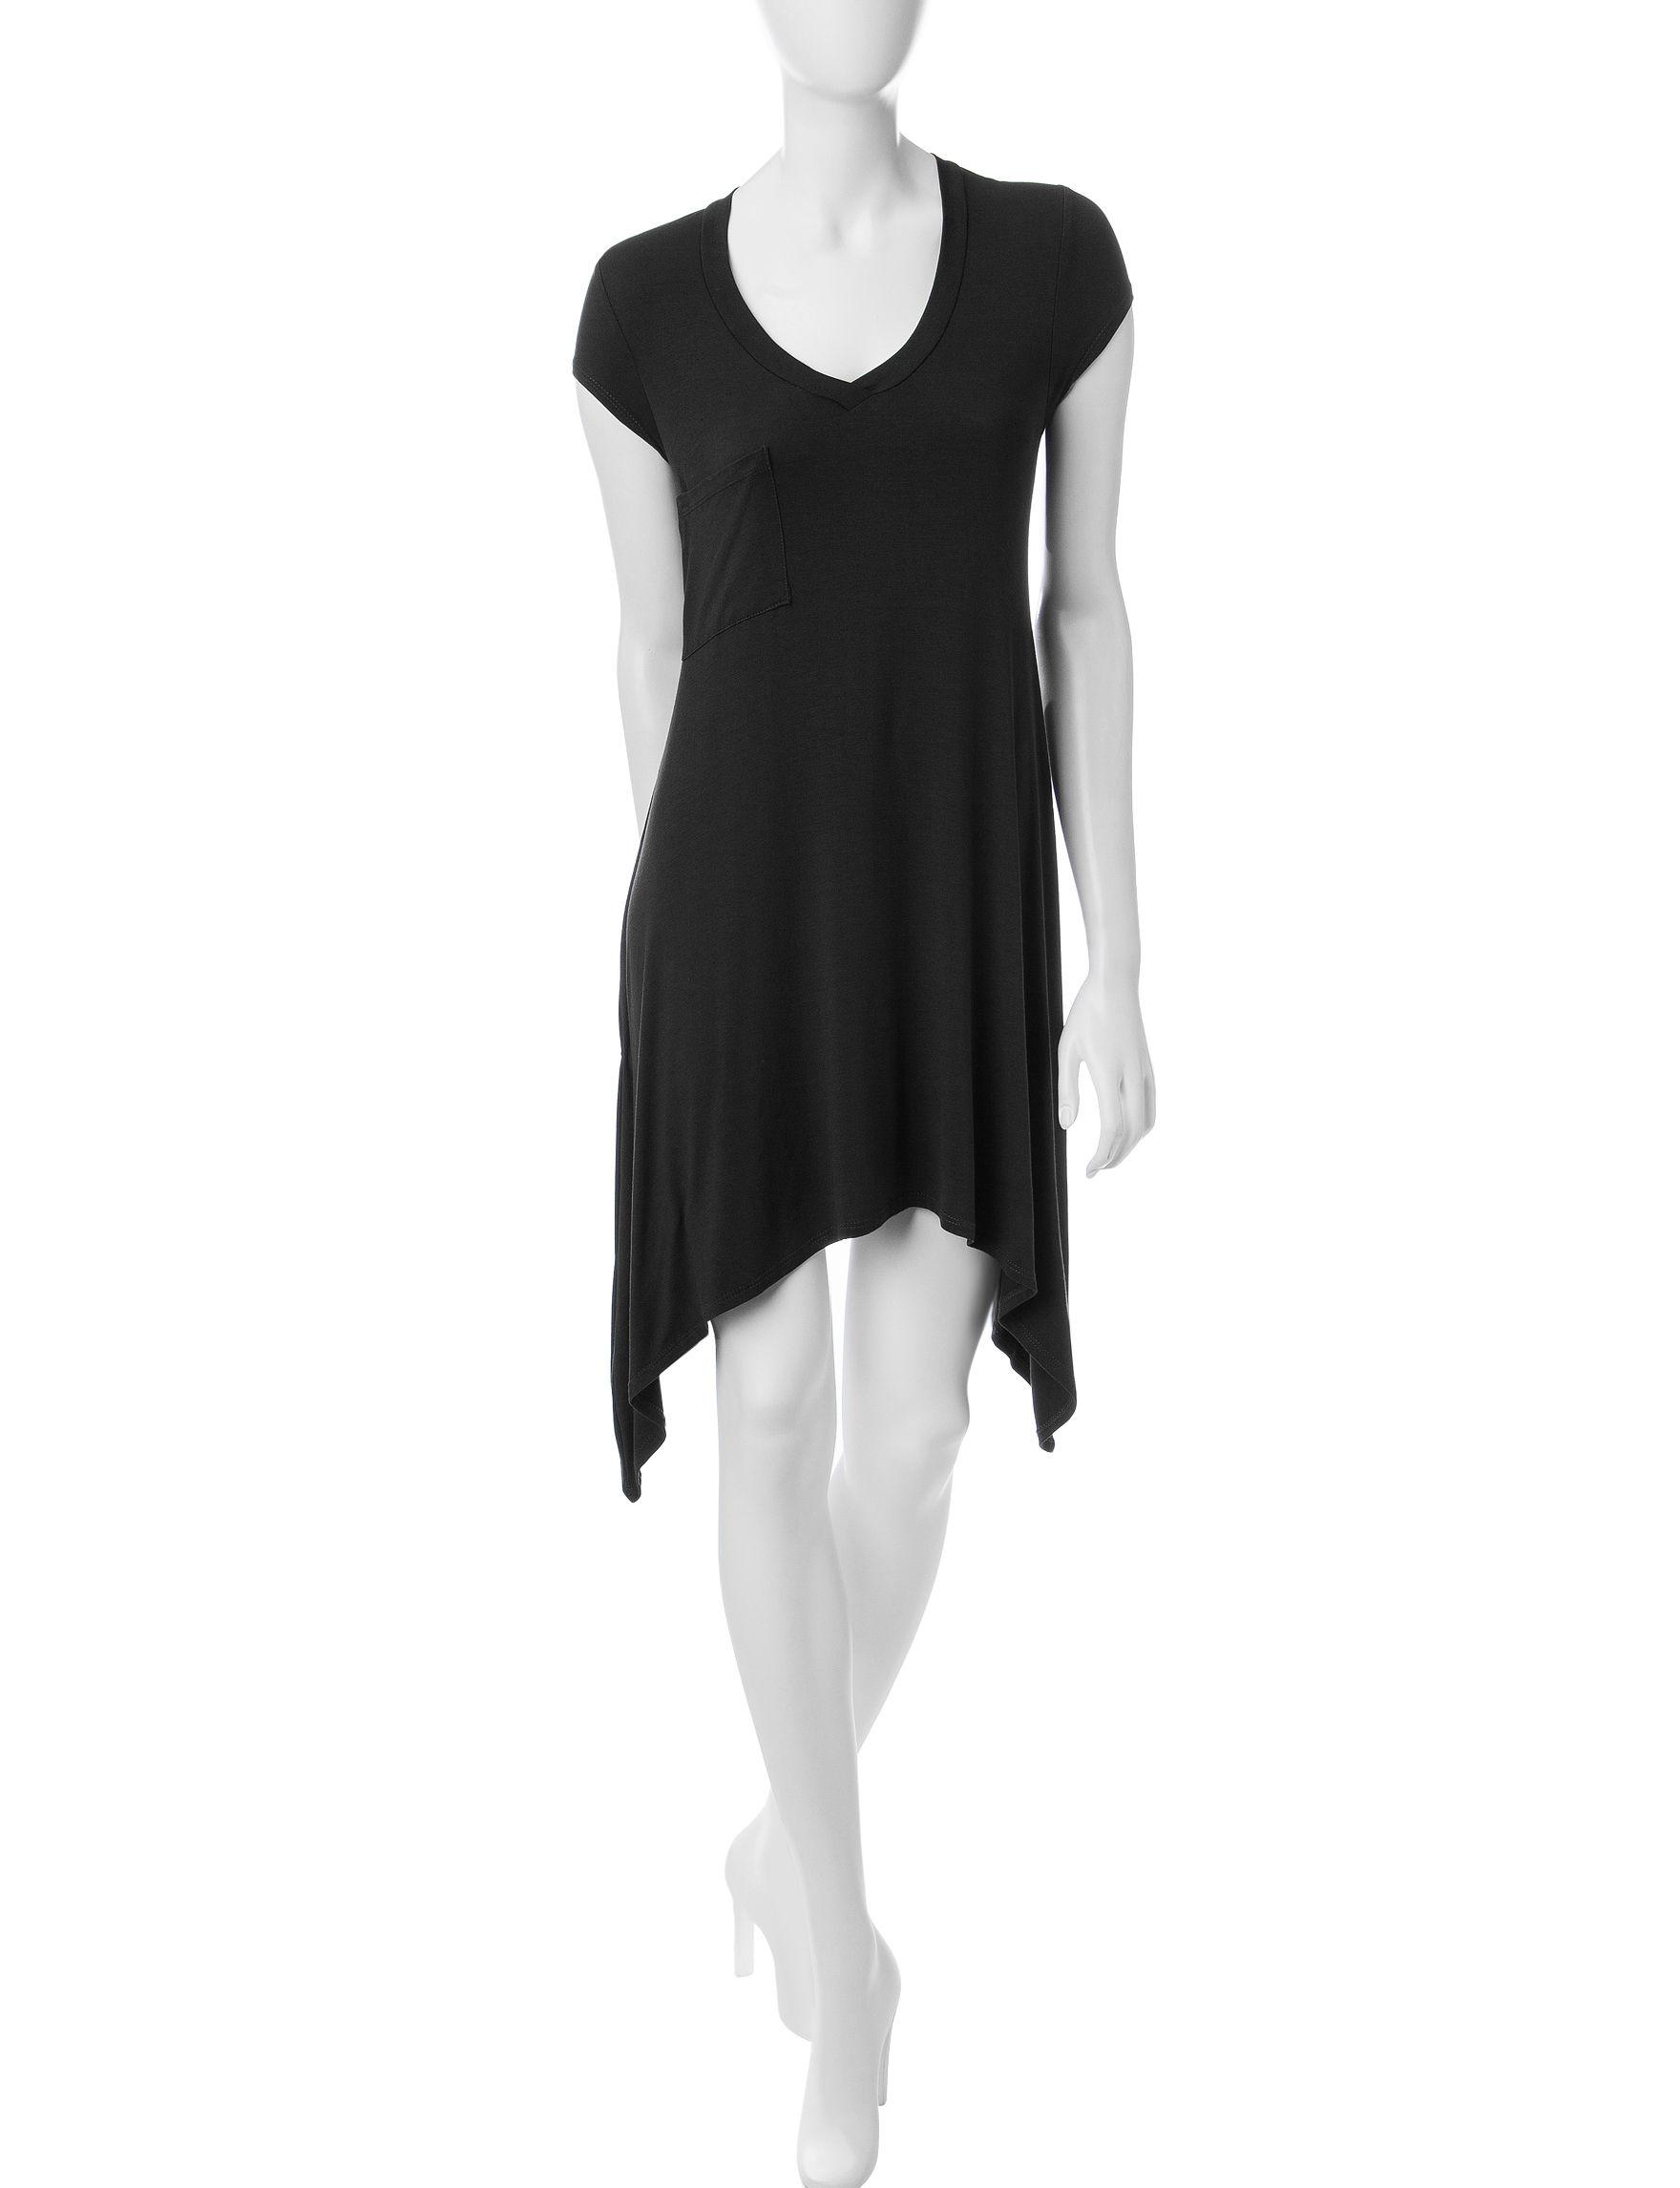 Ultra Flirt Black Fit & Flare Dresses